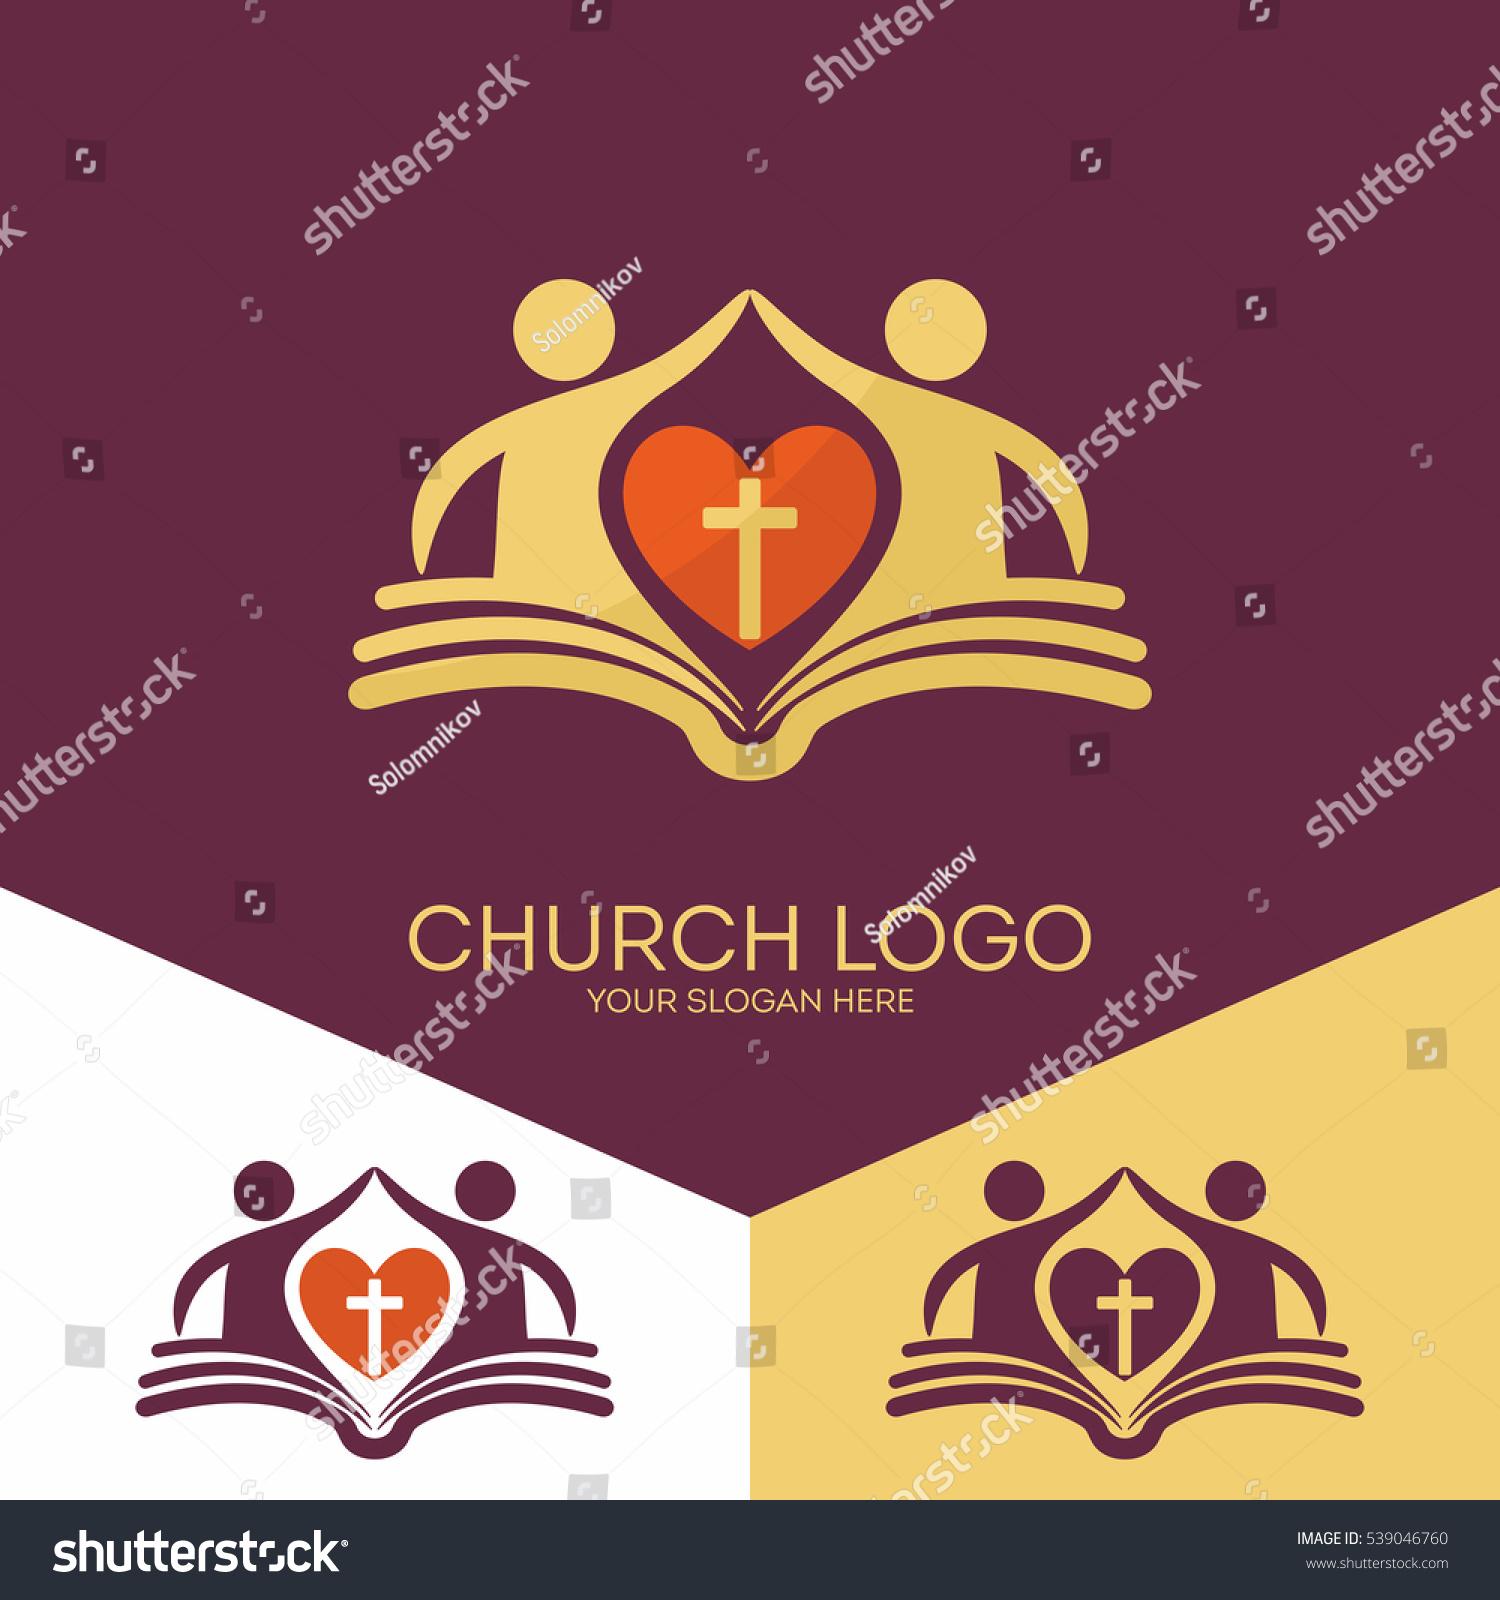 Church Logo Christian Symbols Church Based Stock Vector Royalty